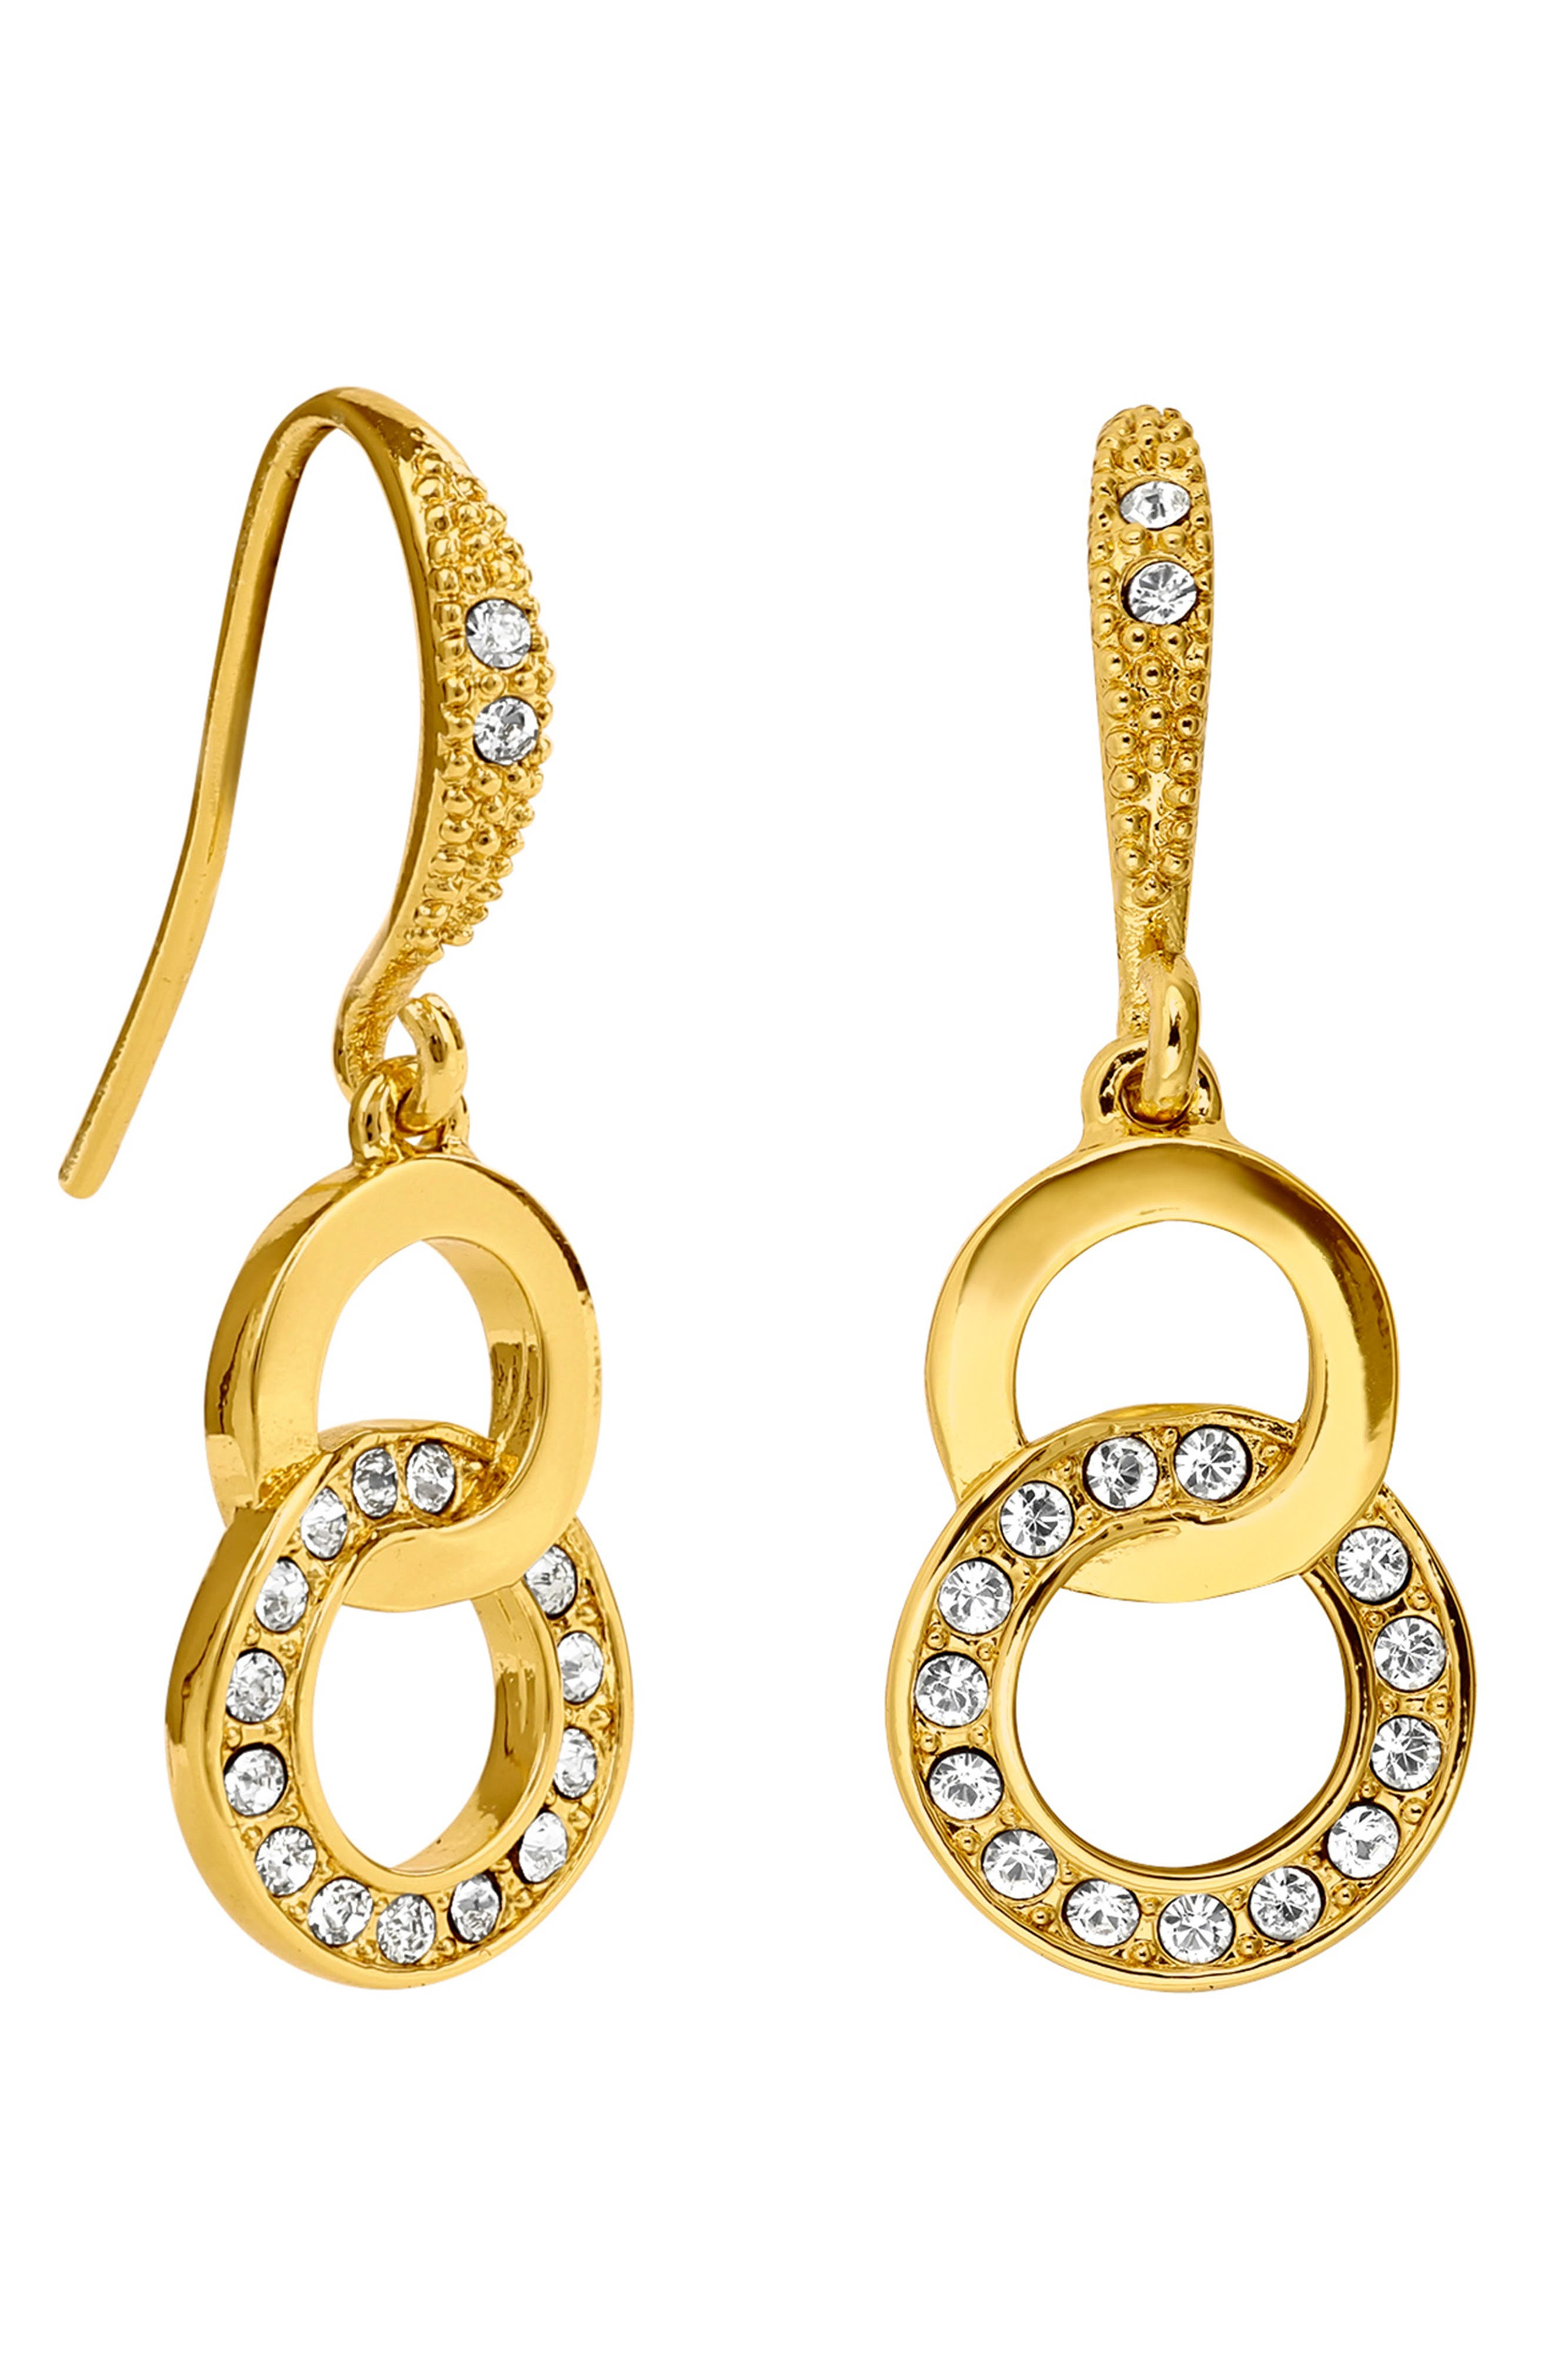 Interlocking Ring Drop Earrings,                             Main thumbnail 1, color,                             GOLD